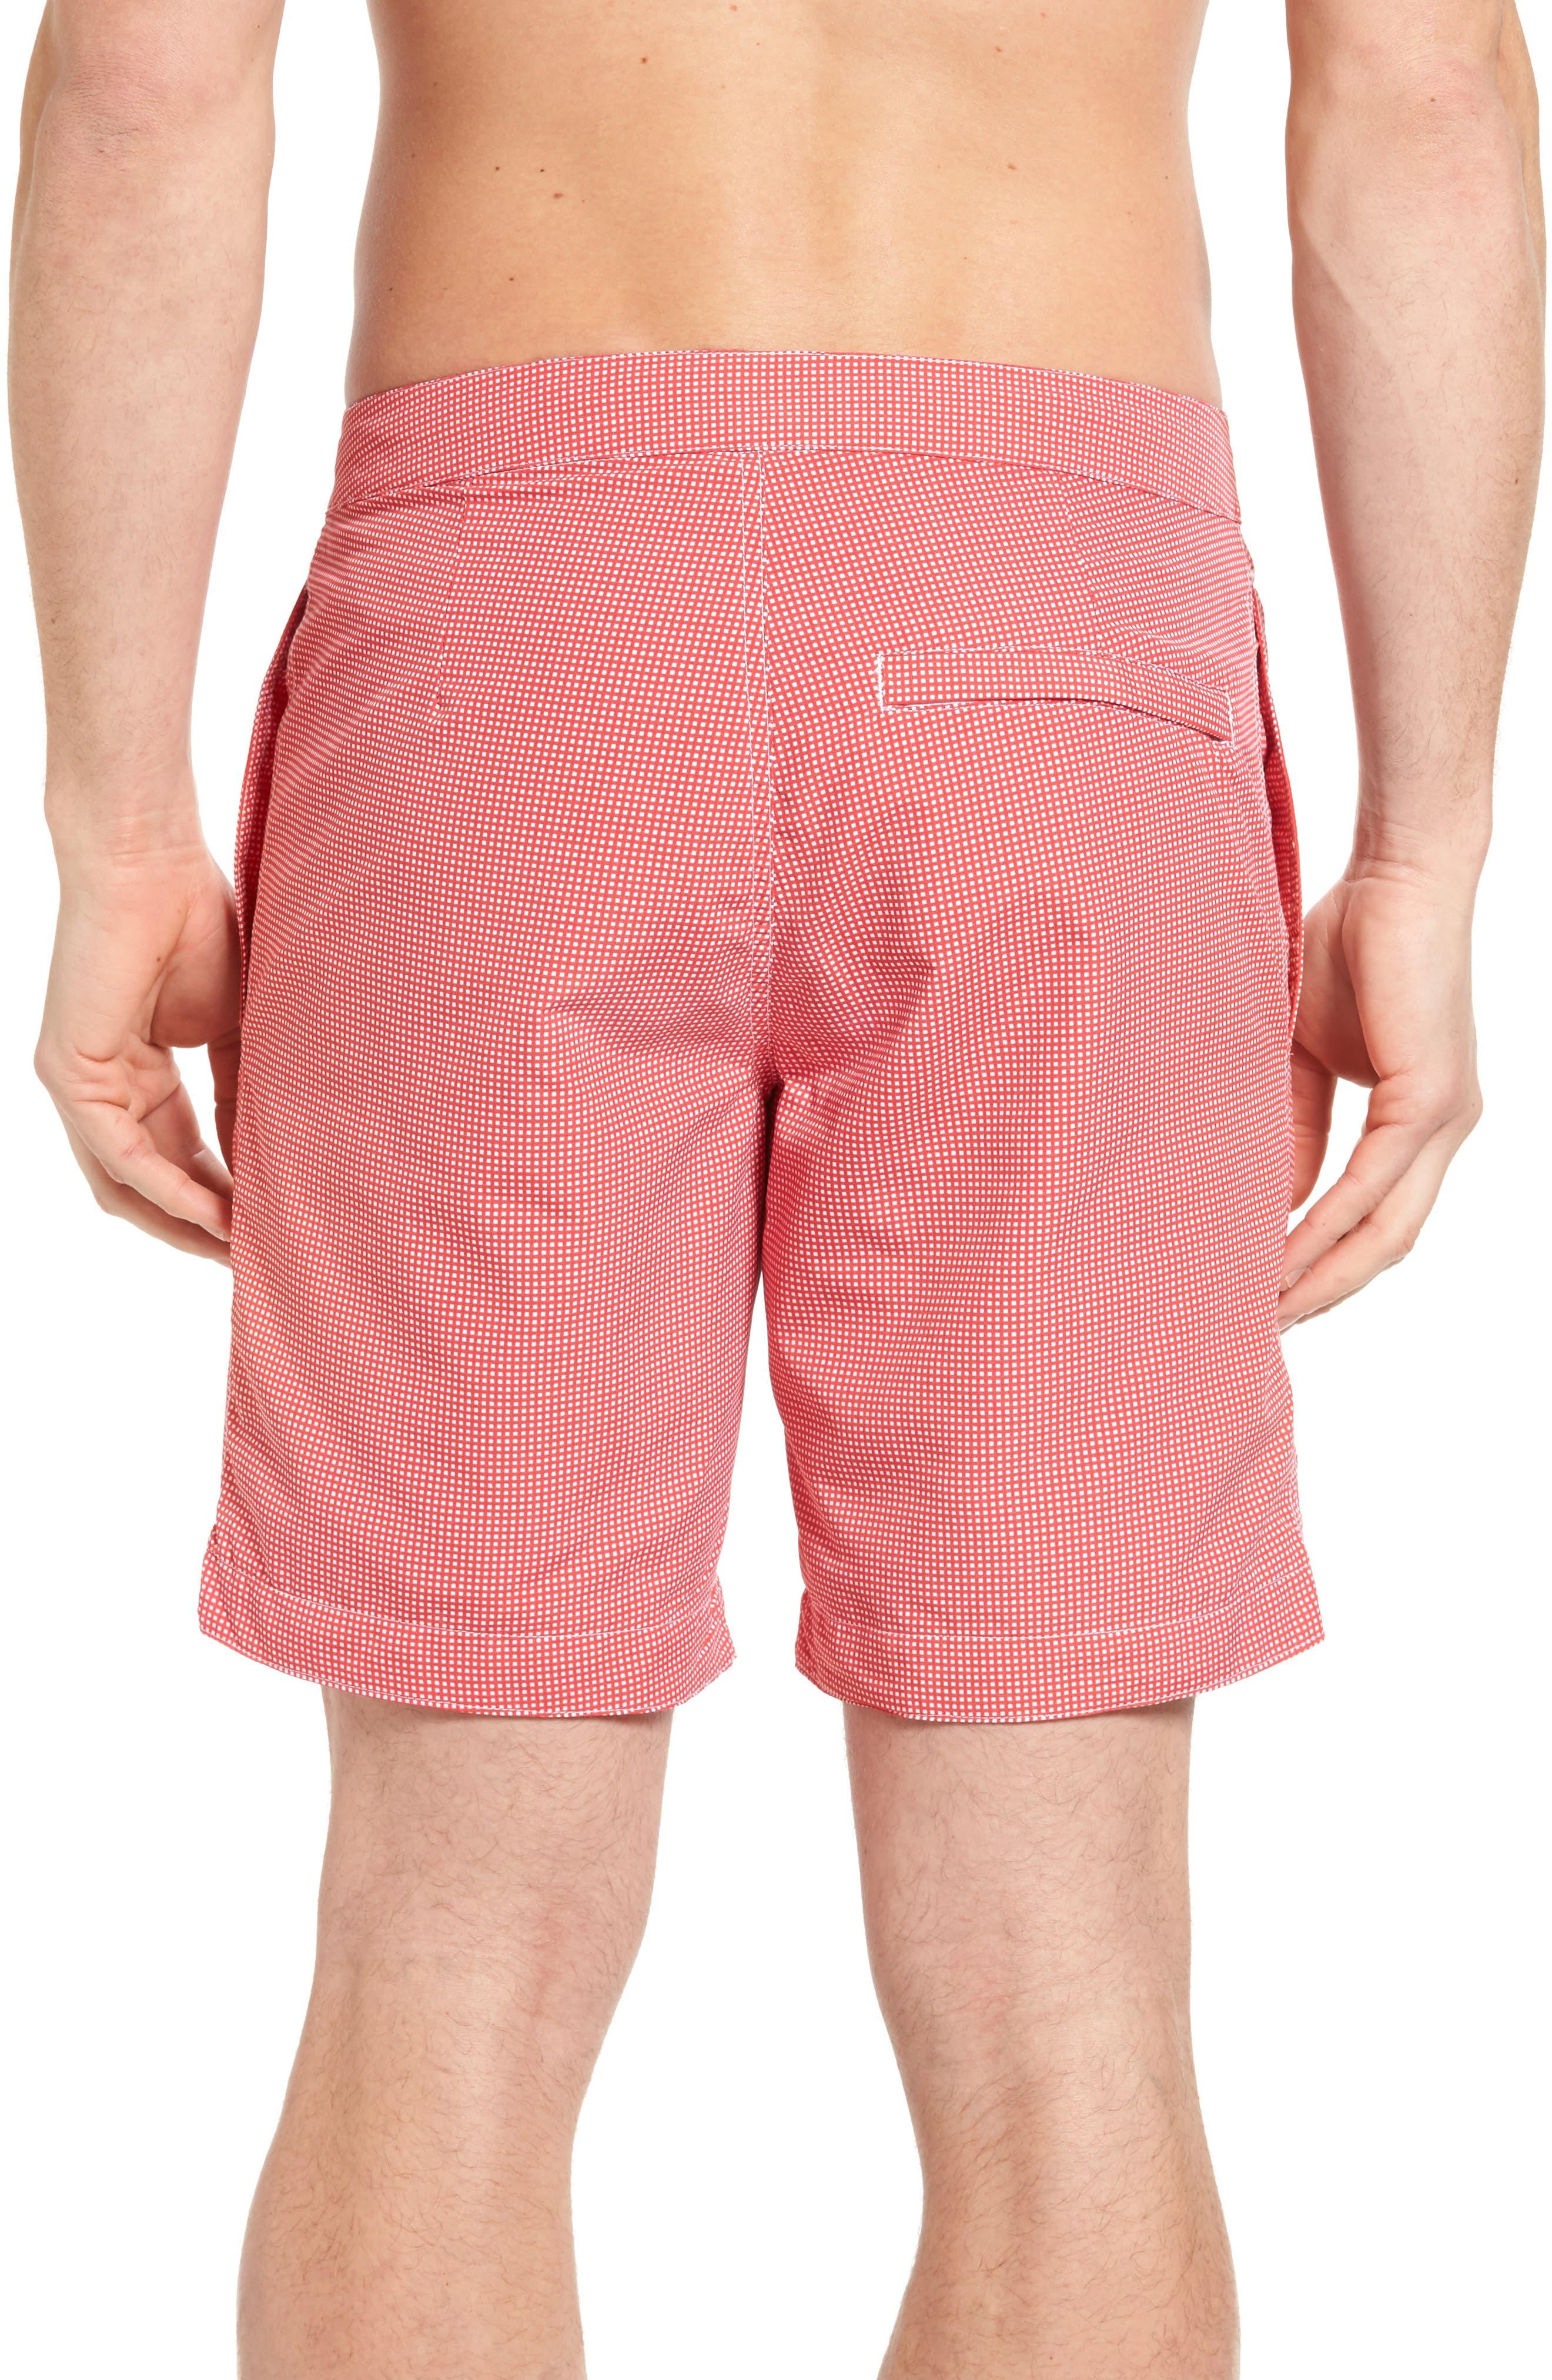 Aruba Microcheck Tailored Fit 8.5 Inch Swim Trunks,                             Alternate thumbnail 2, color,                             611